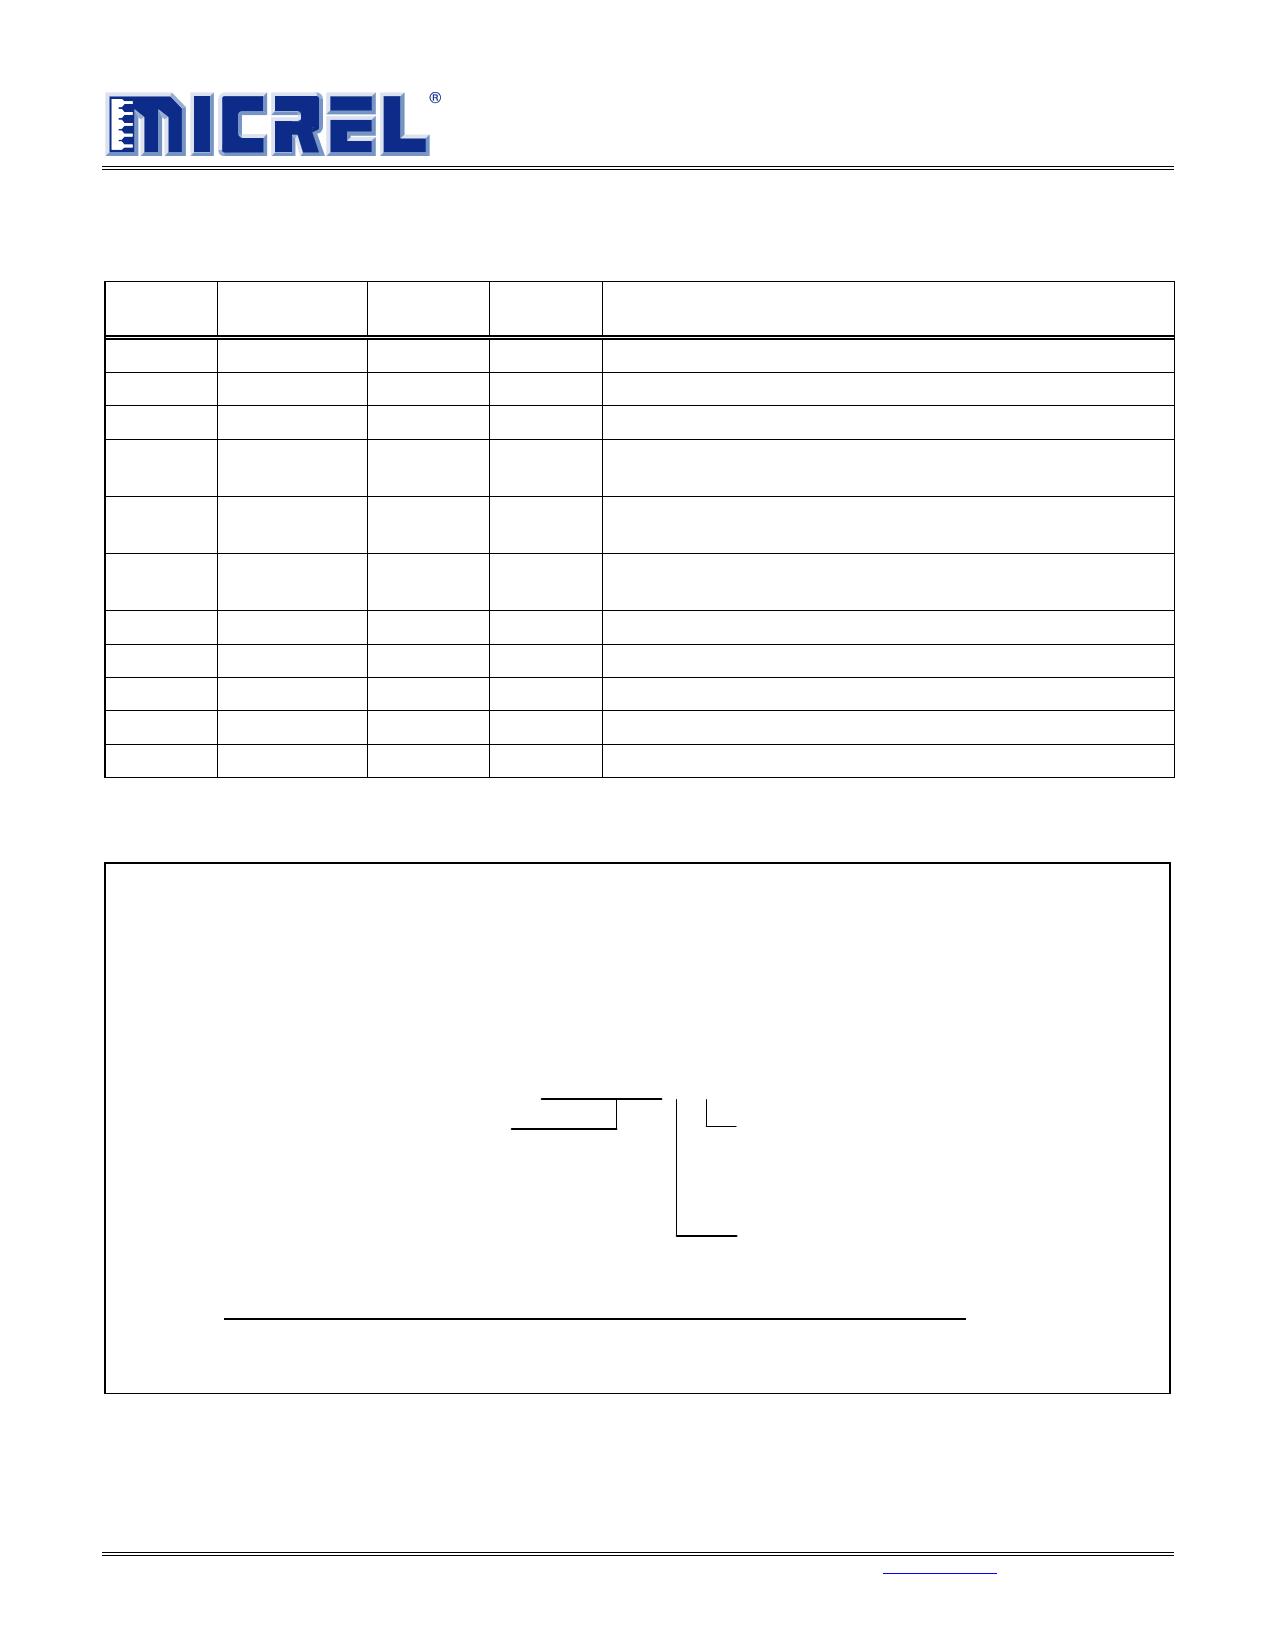 PL602-00 pdf, 반도체, 판매, 대치품